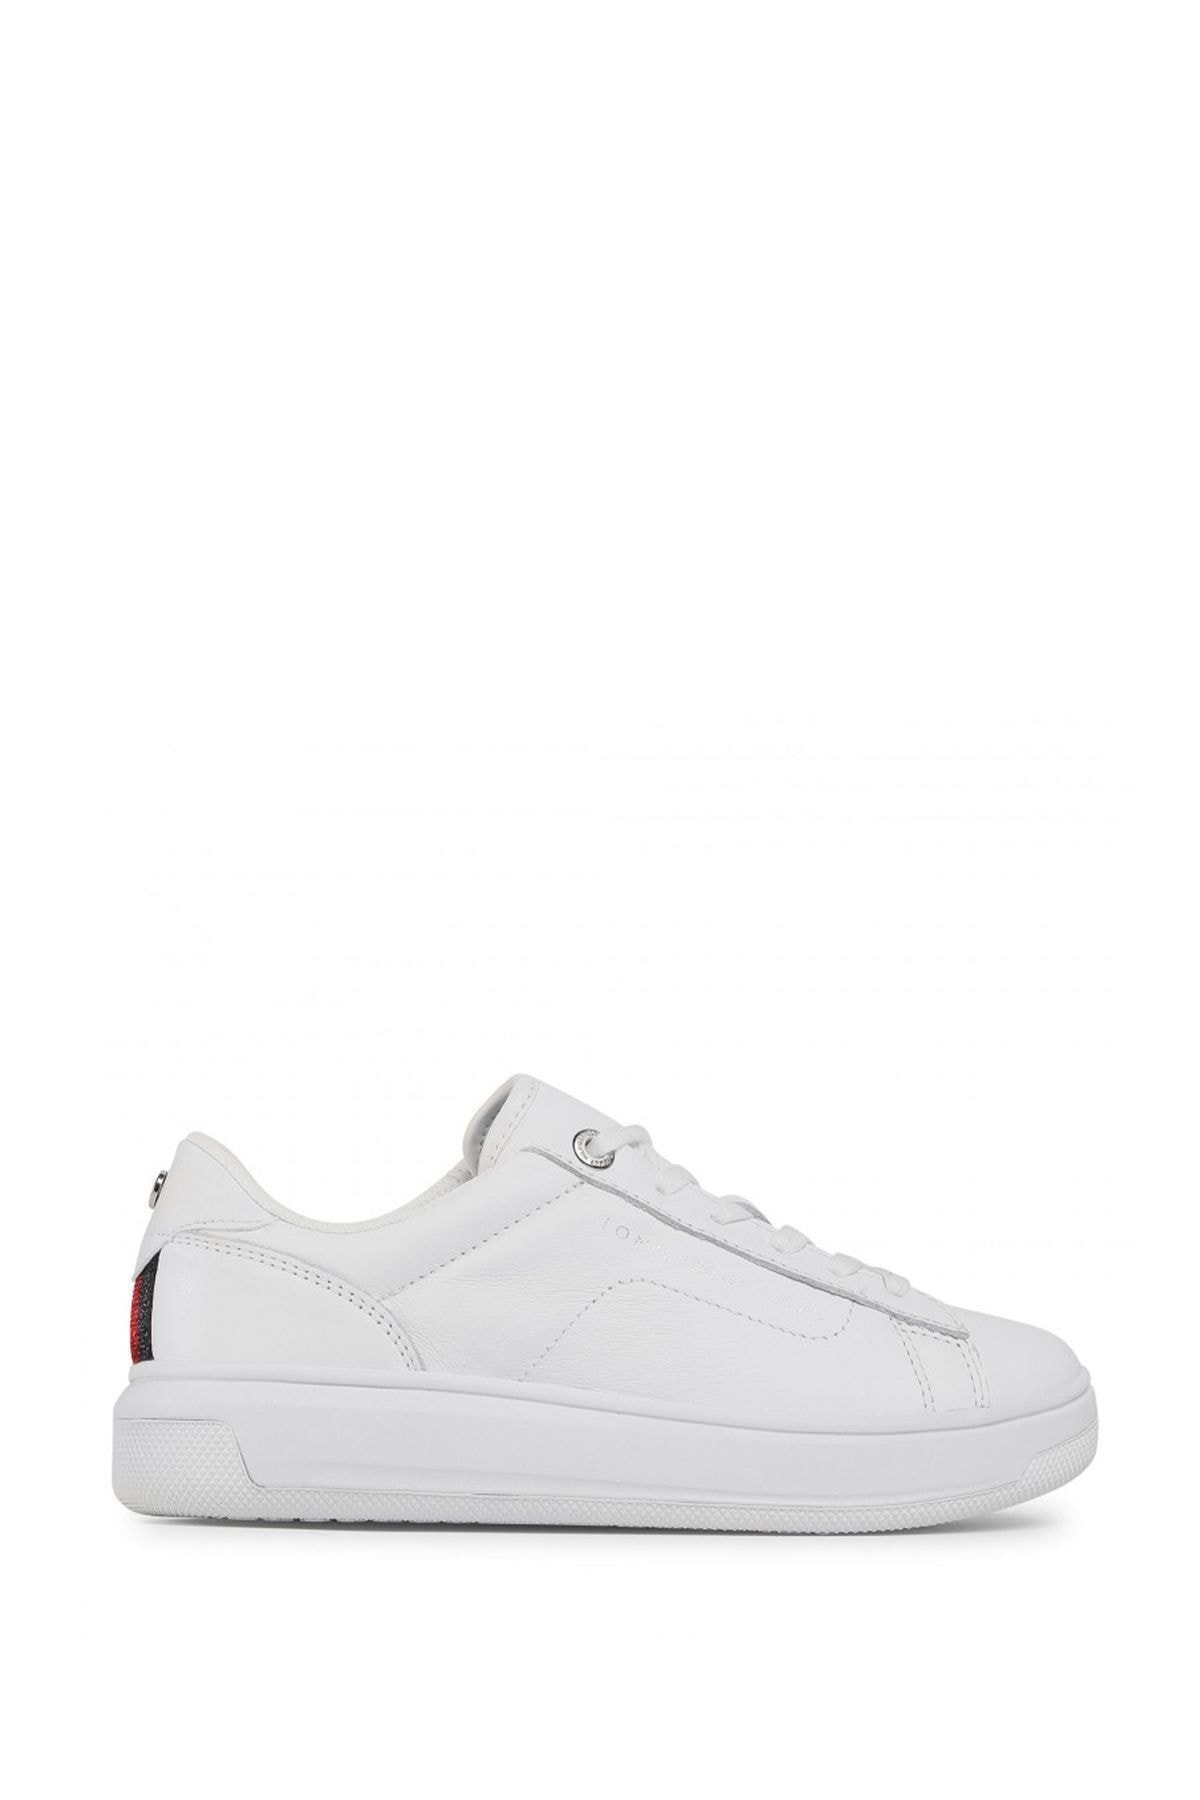 Tommy Hilfiger Kadın Beyaz Leather Cupsole Kadın Sneaker Fw0fw05009 2